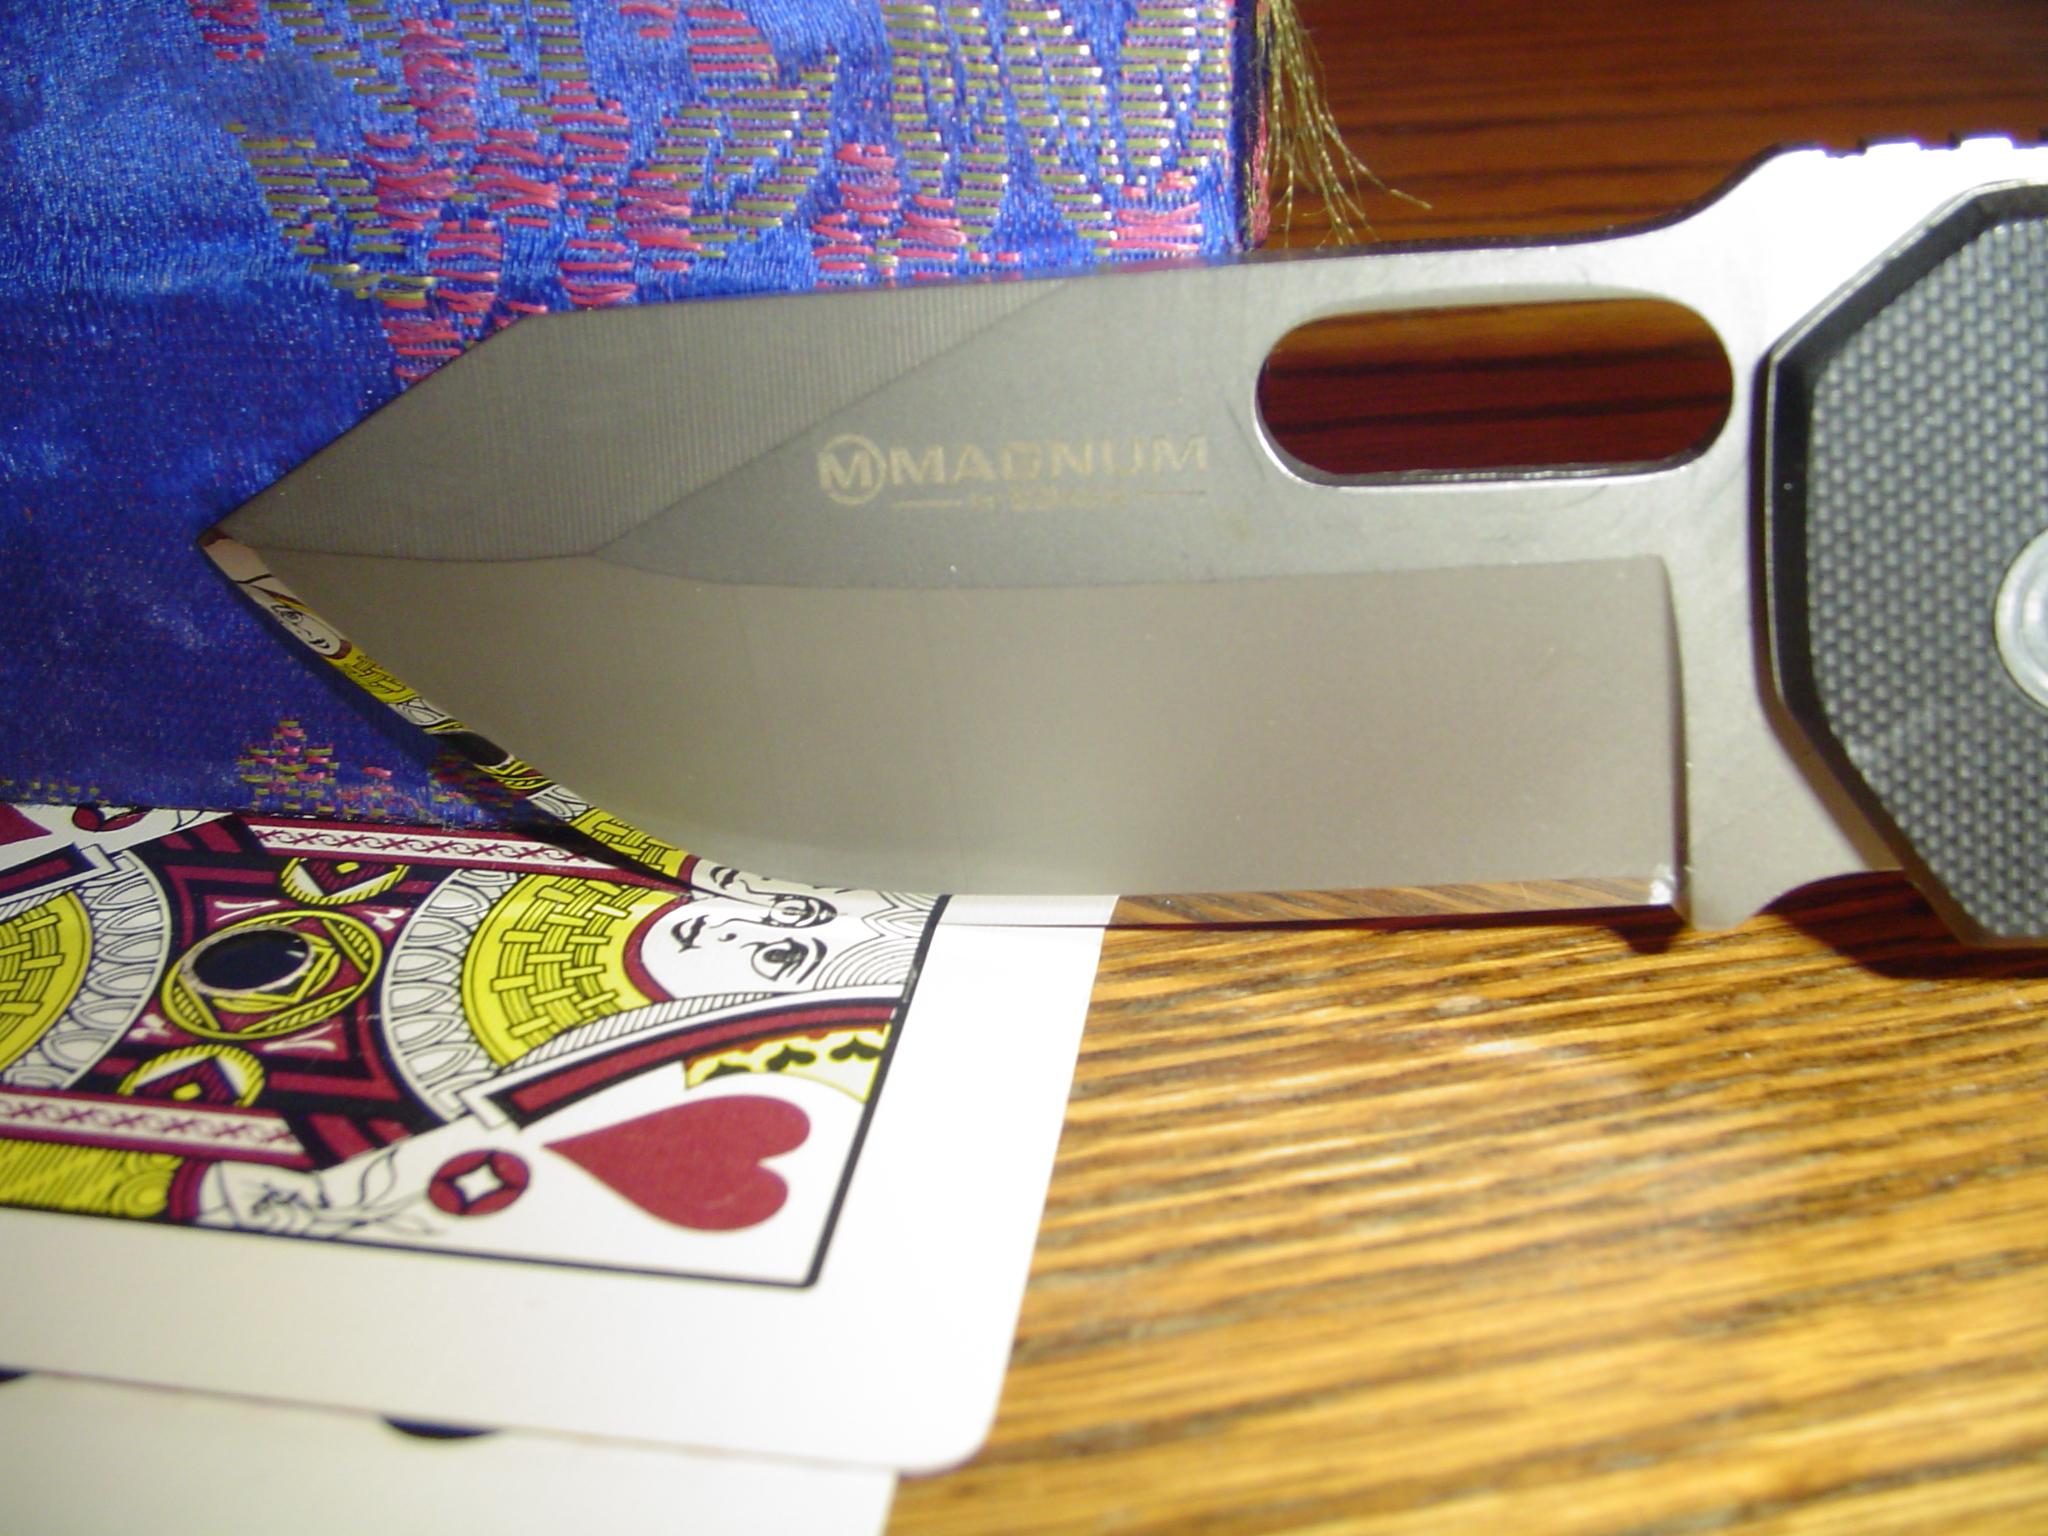 Denton, a good polisher can shine up a railroad spike...-dsc02801.jpg